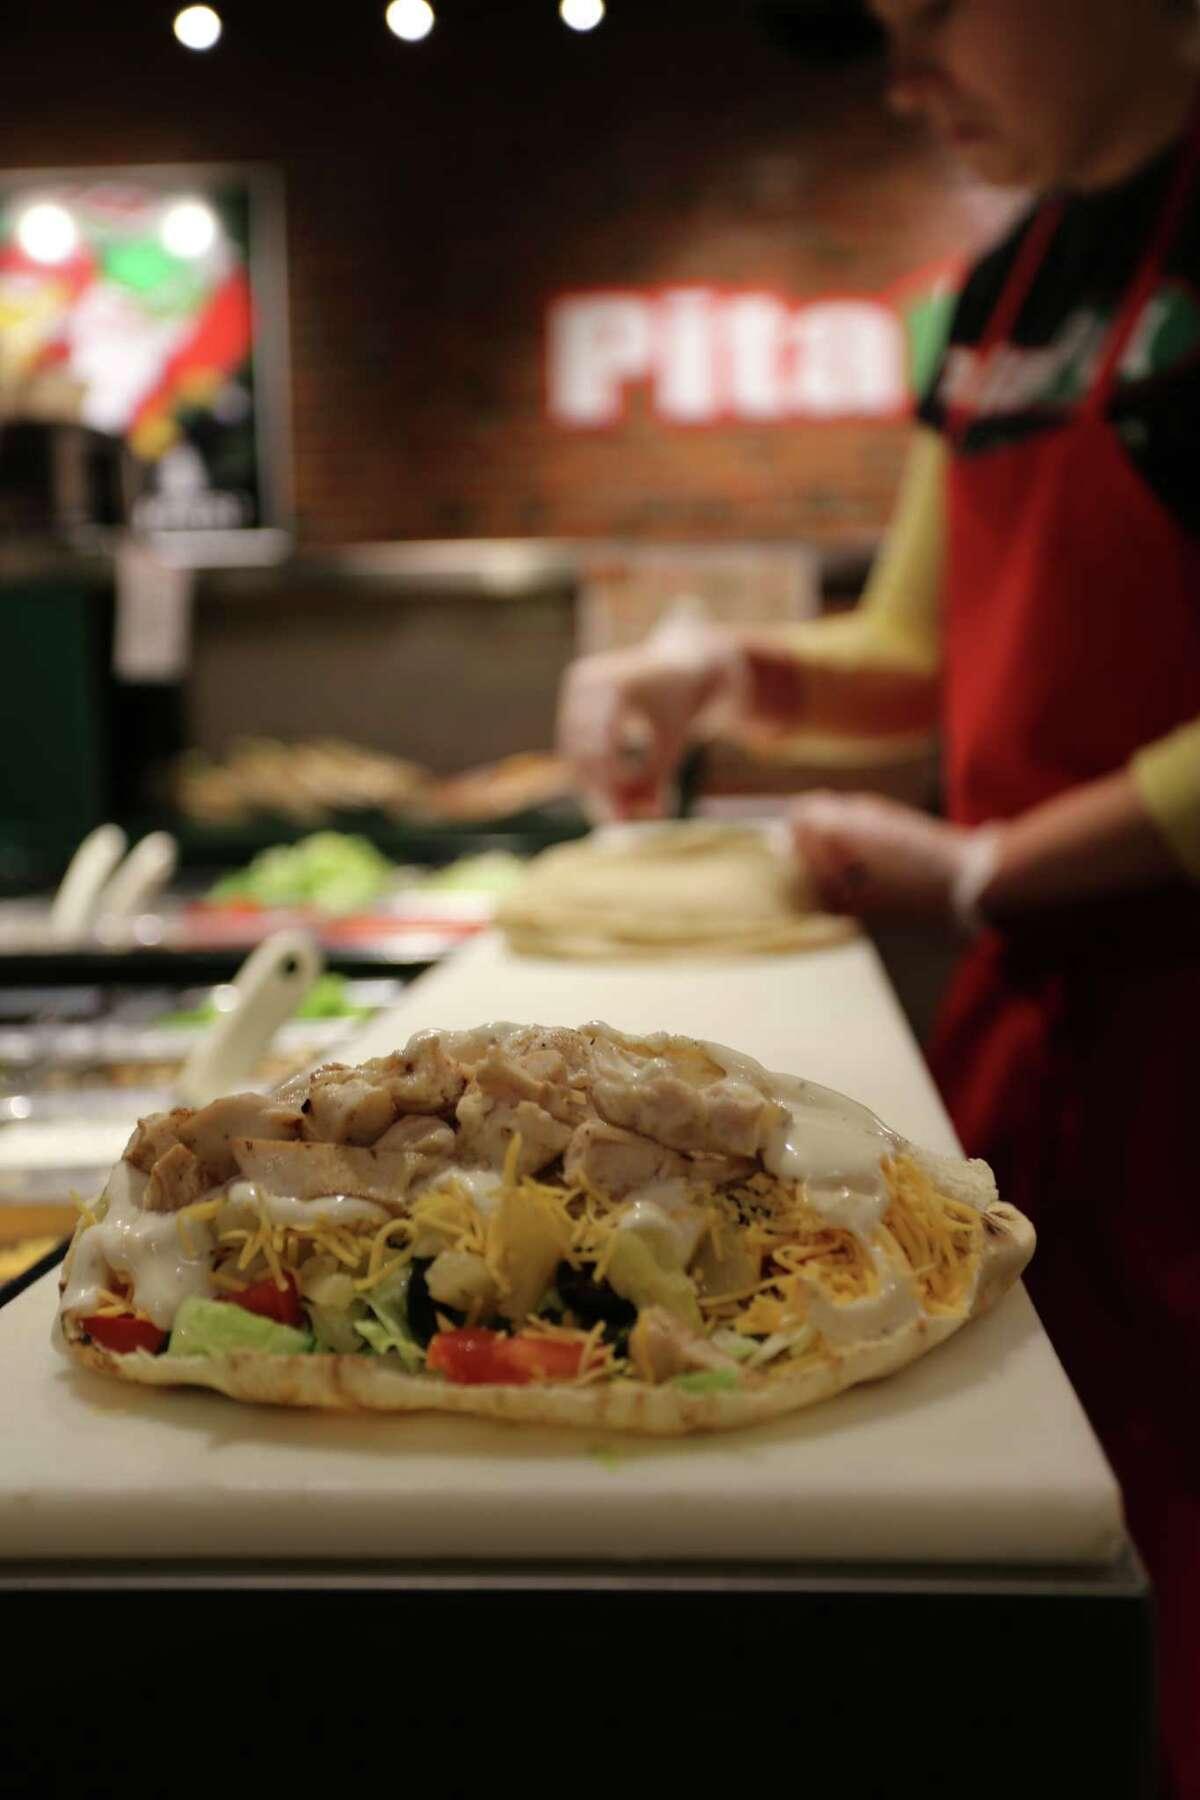 A new Pita Pit fast food restaurant will open Oct. 13 at 19111 Katy Freeway.